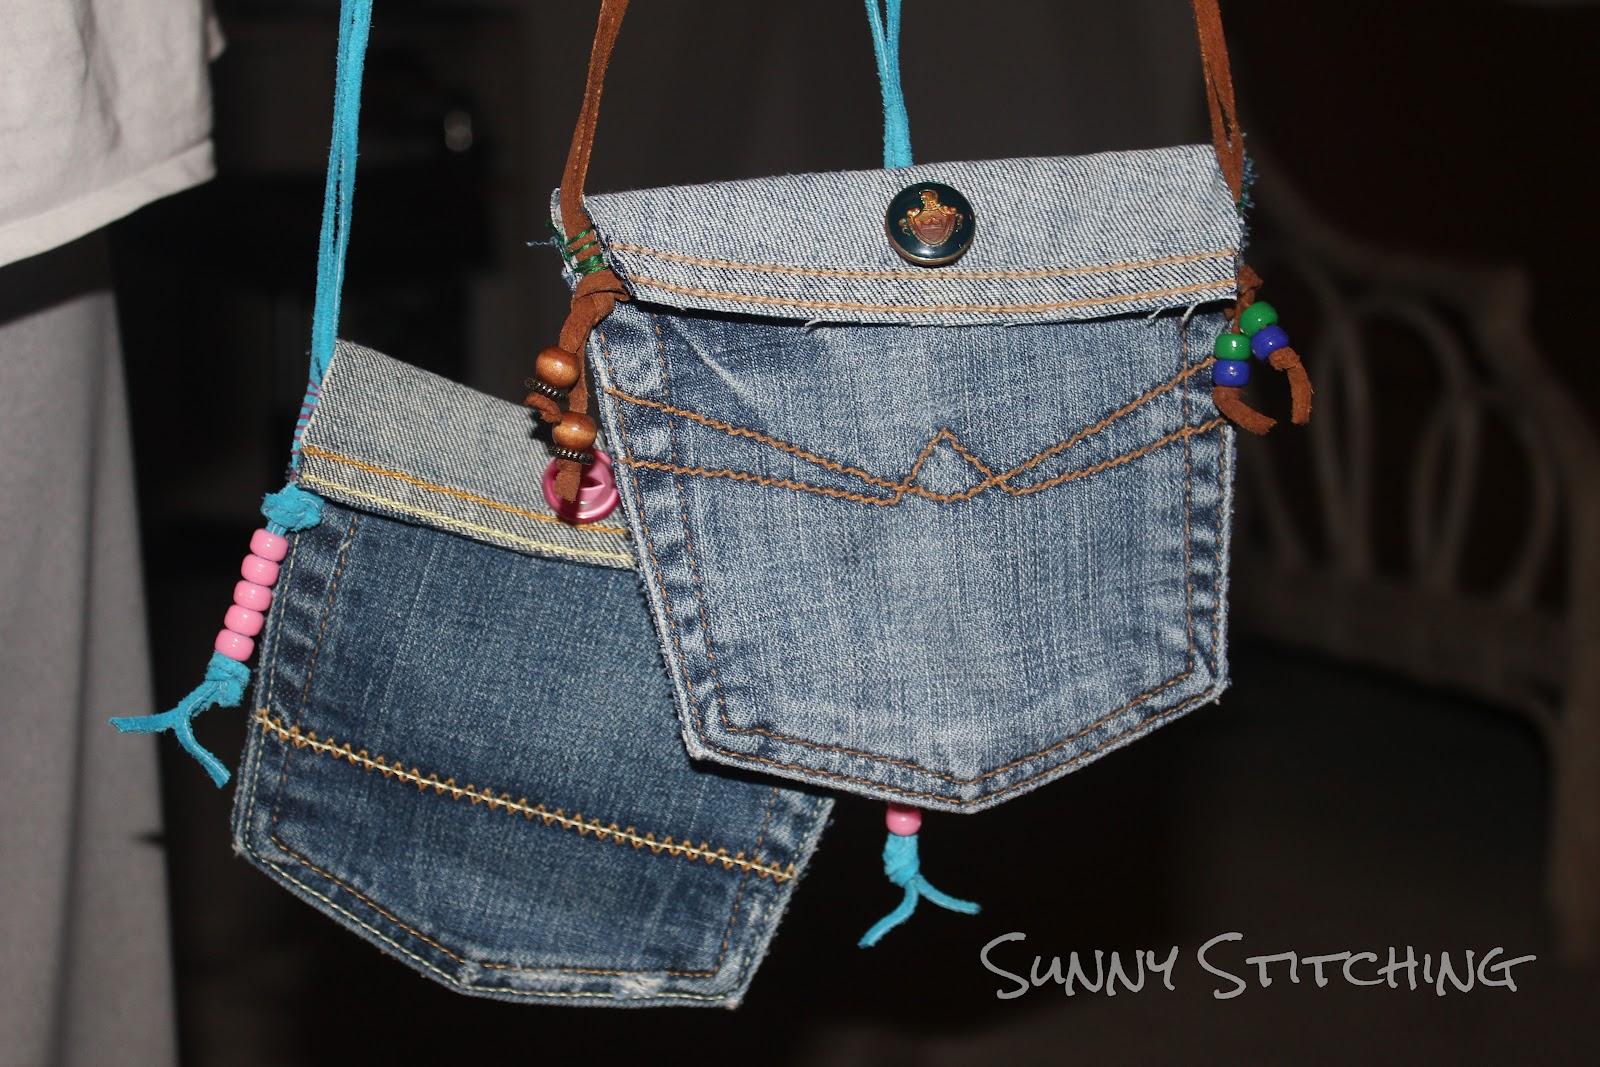 Sunny Stitching Jean Pocket Purse Tutorial